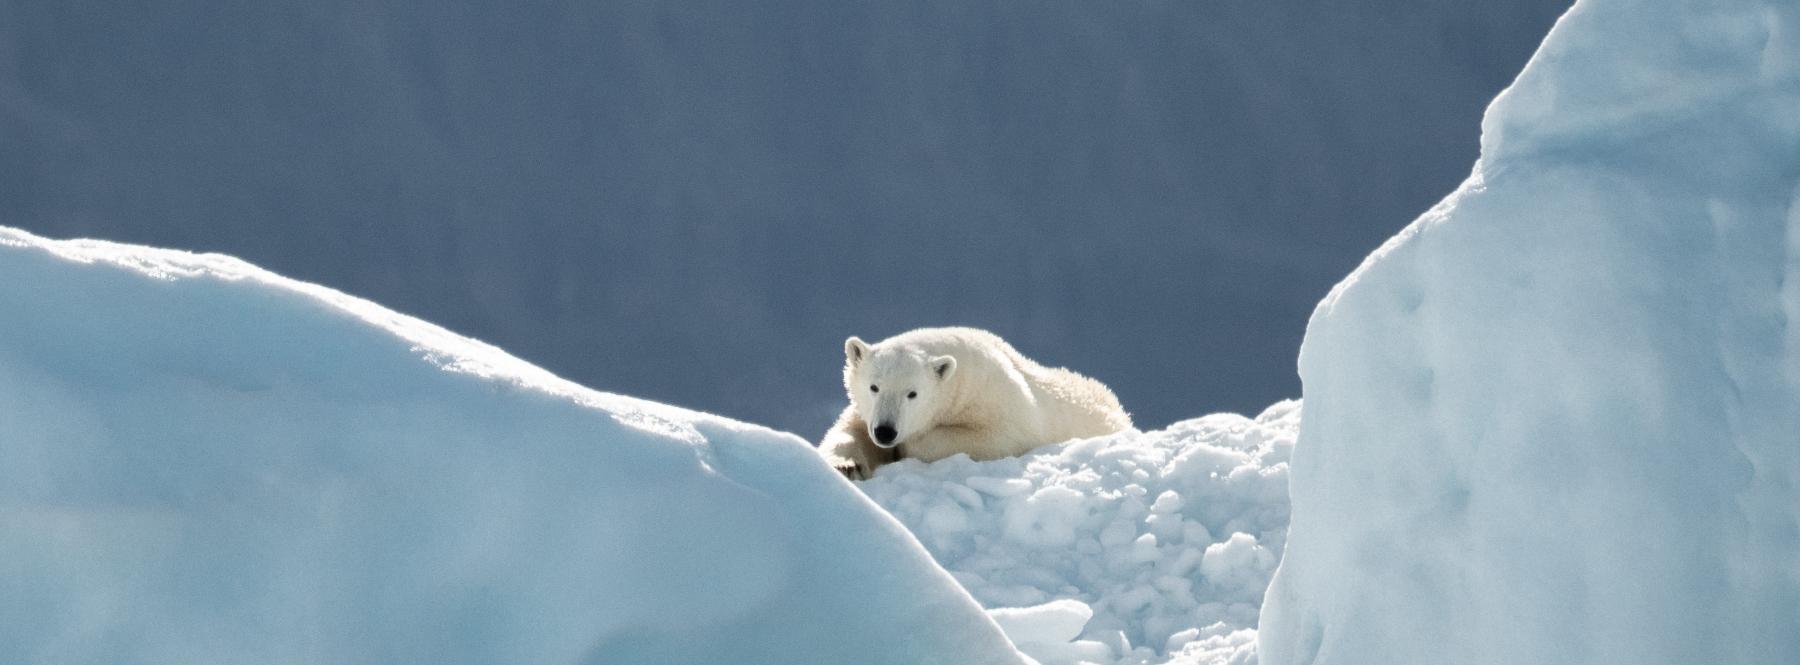 Svaldbard, el archipiélago donde reinan los osos polares